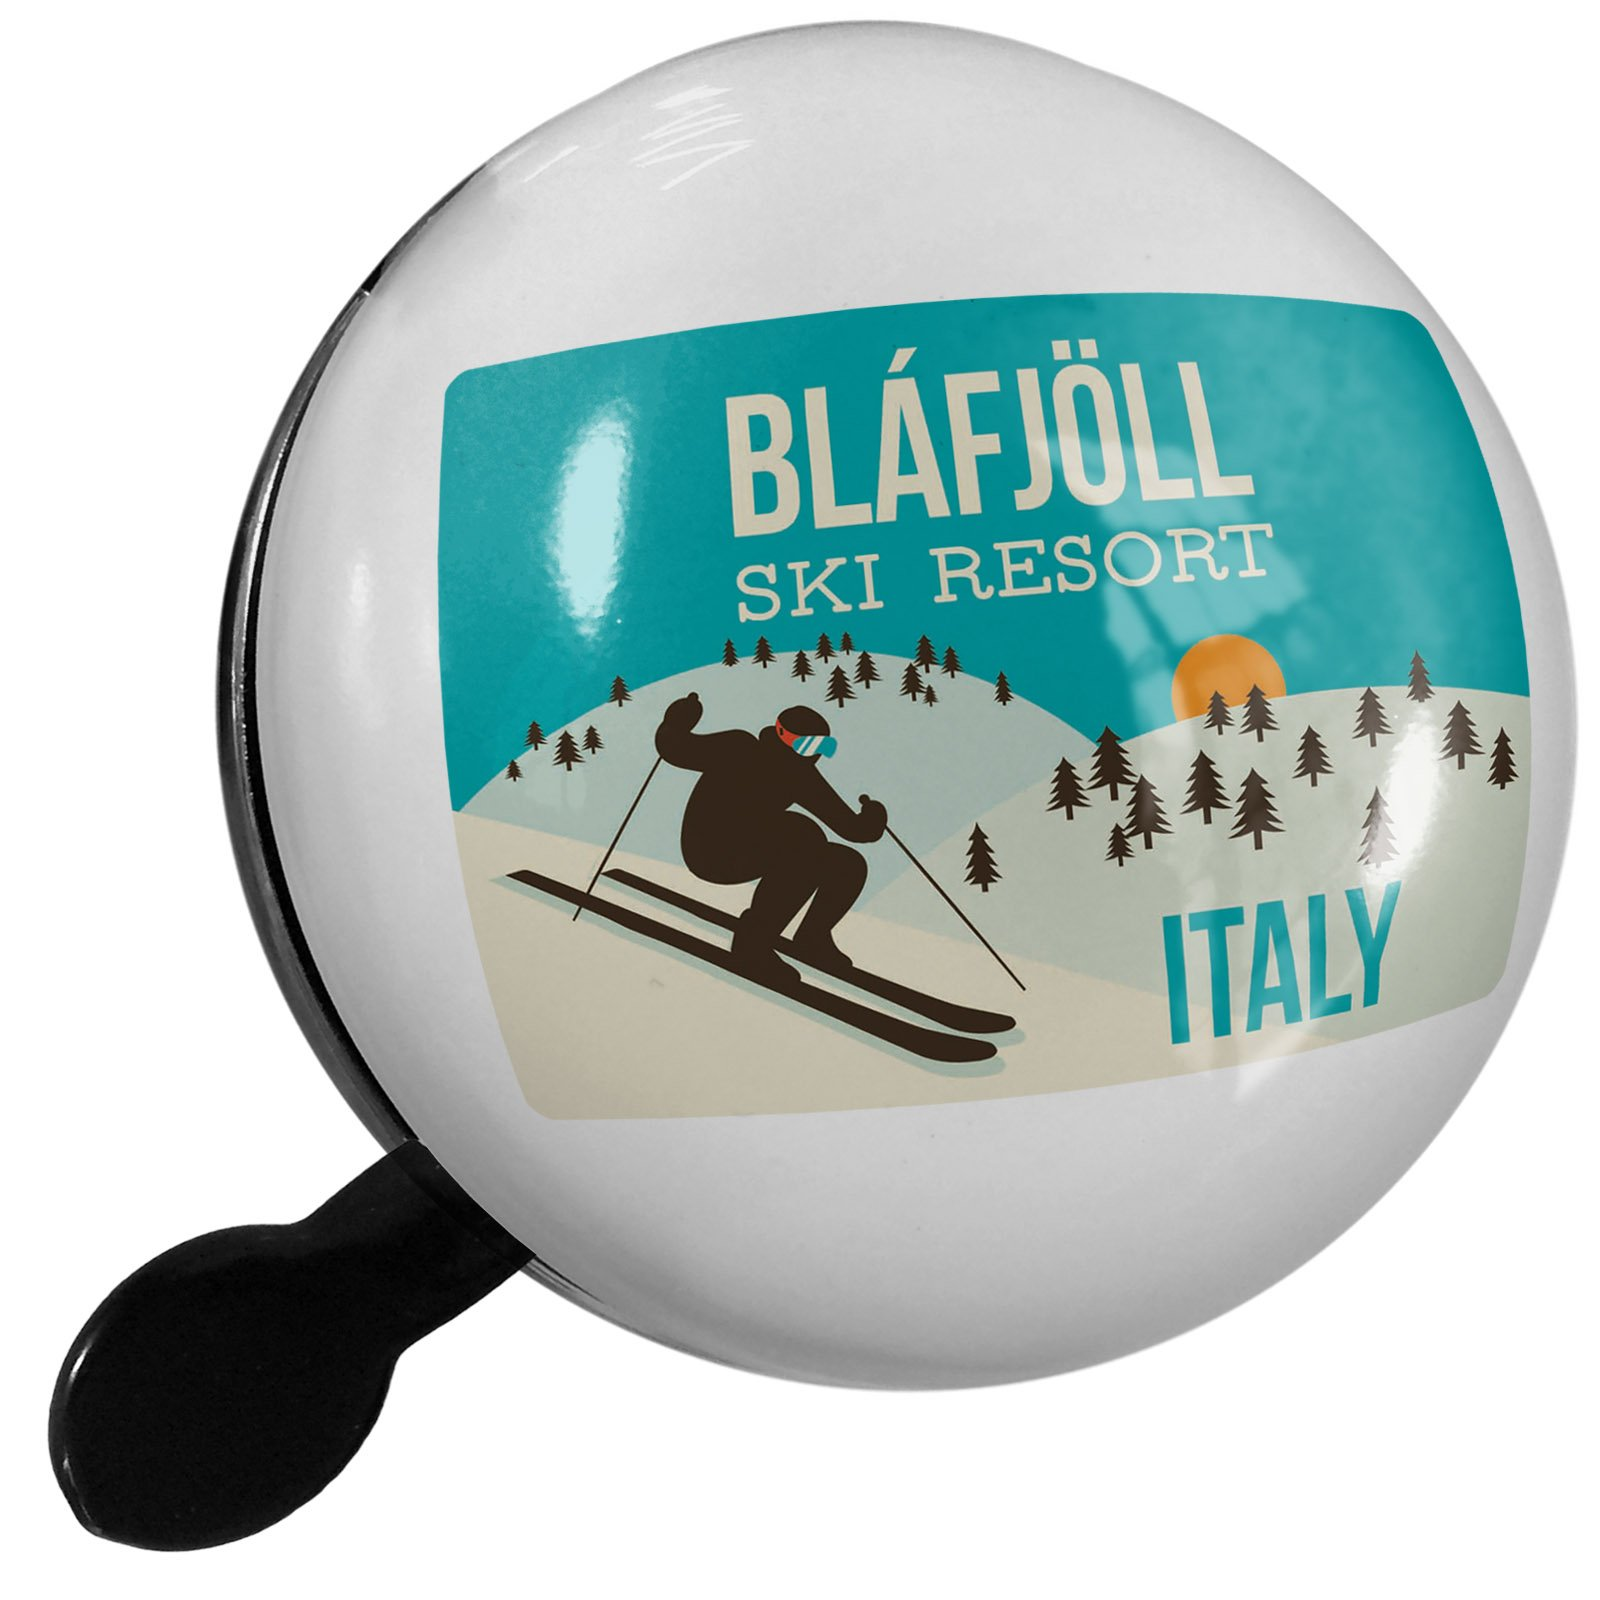 Small Bike Bell Bláfjöll Ski Resort - Italy Ski Resort - NEONBLOND